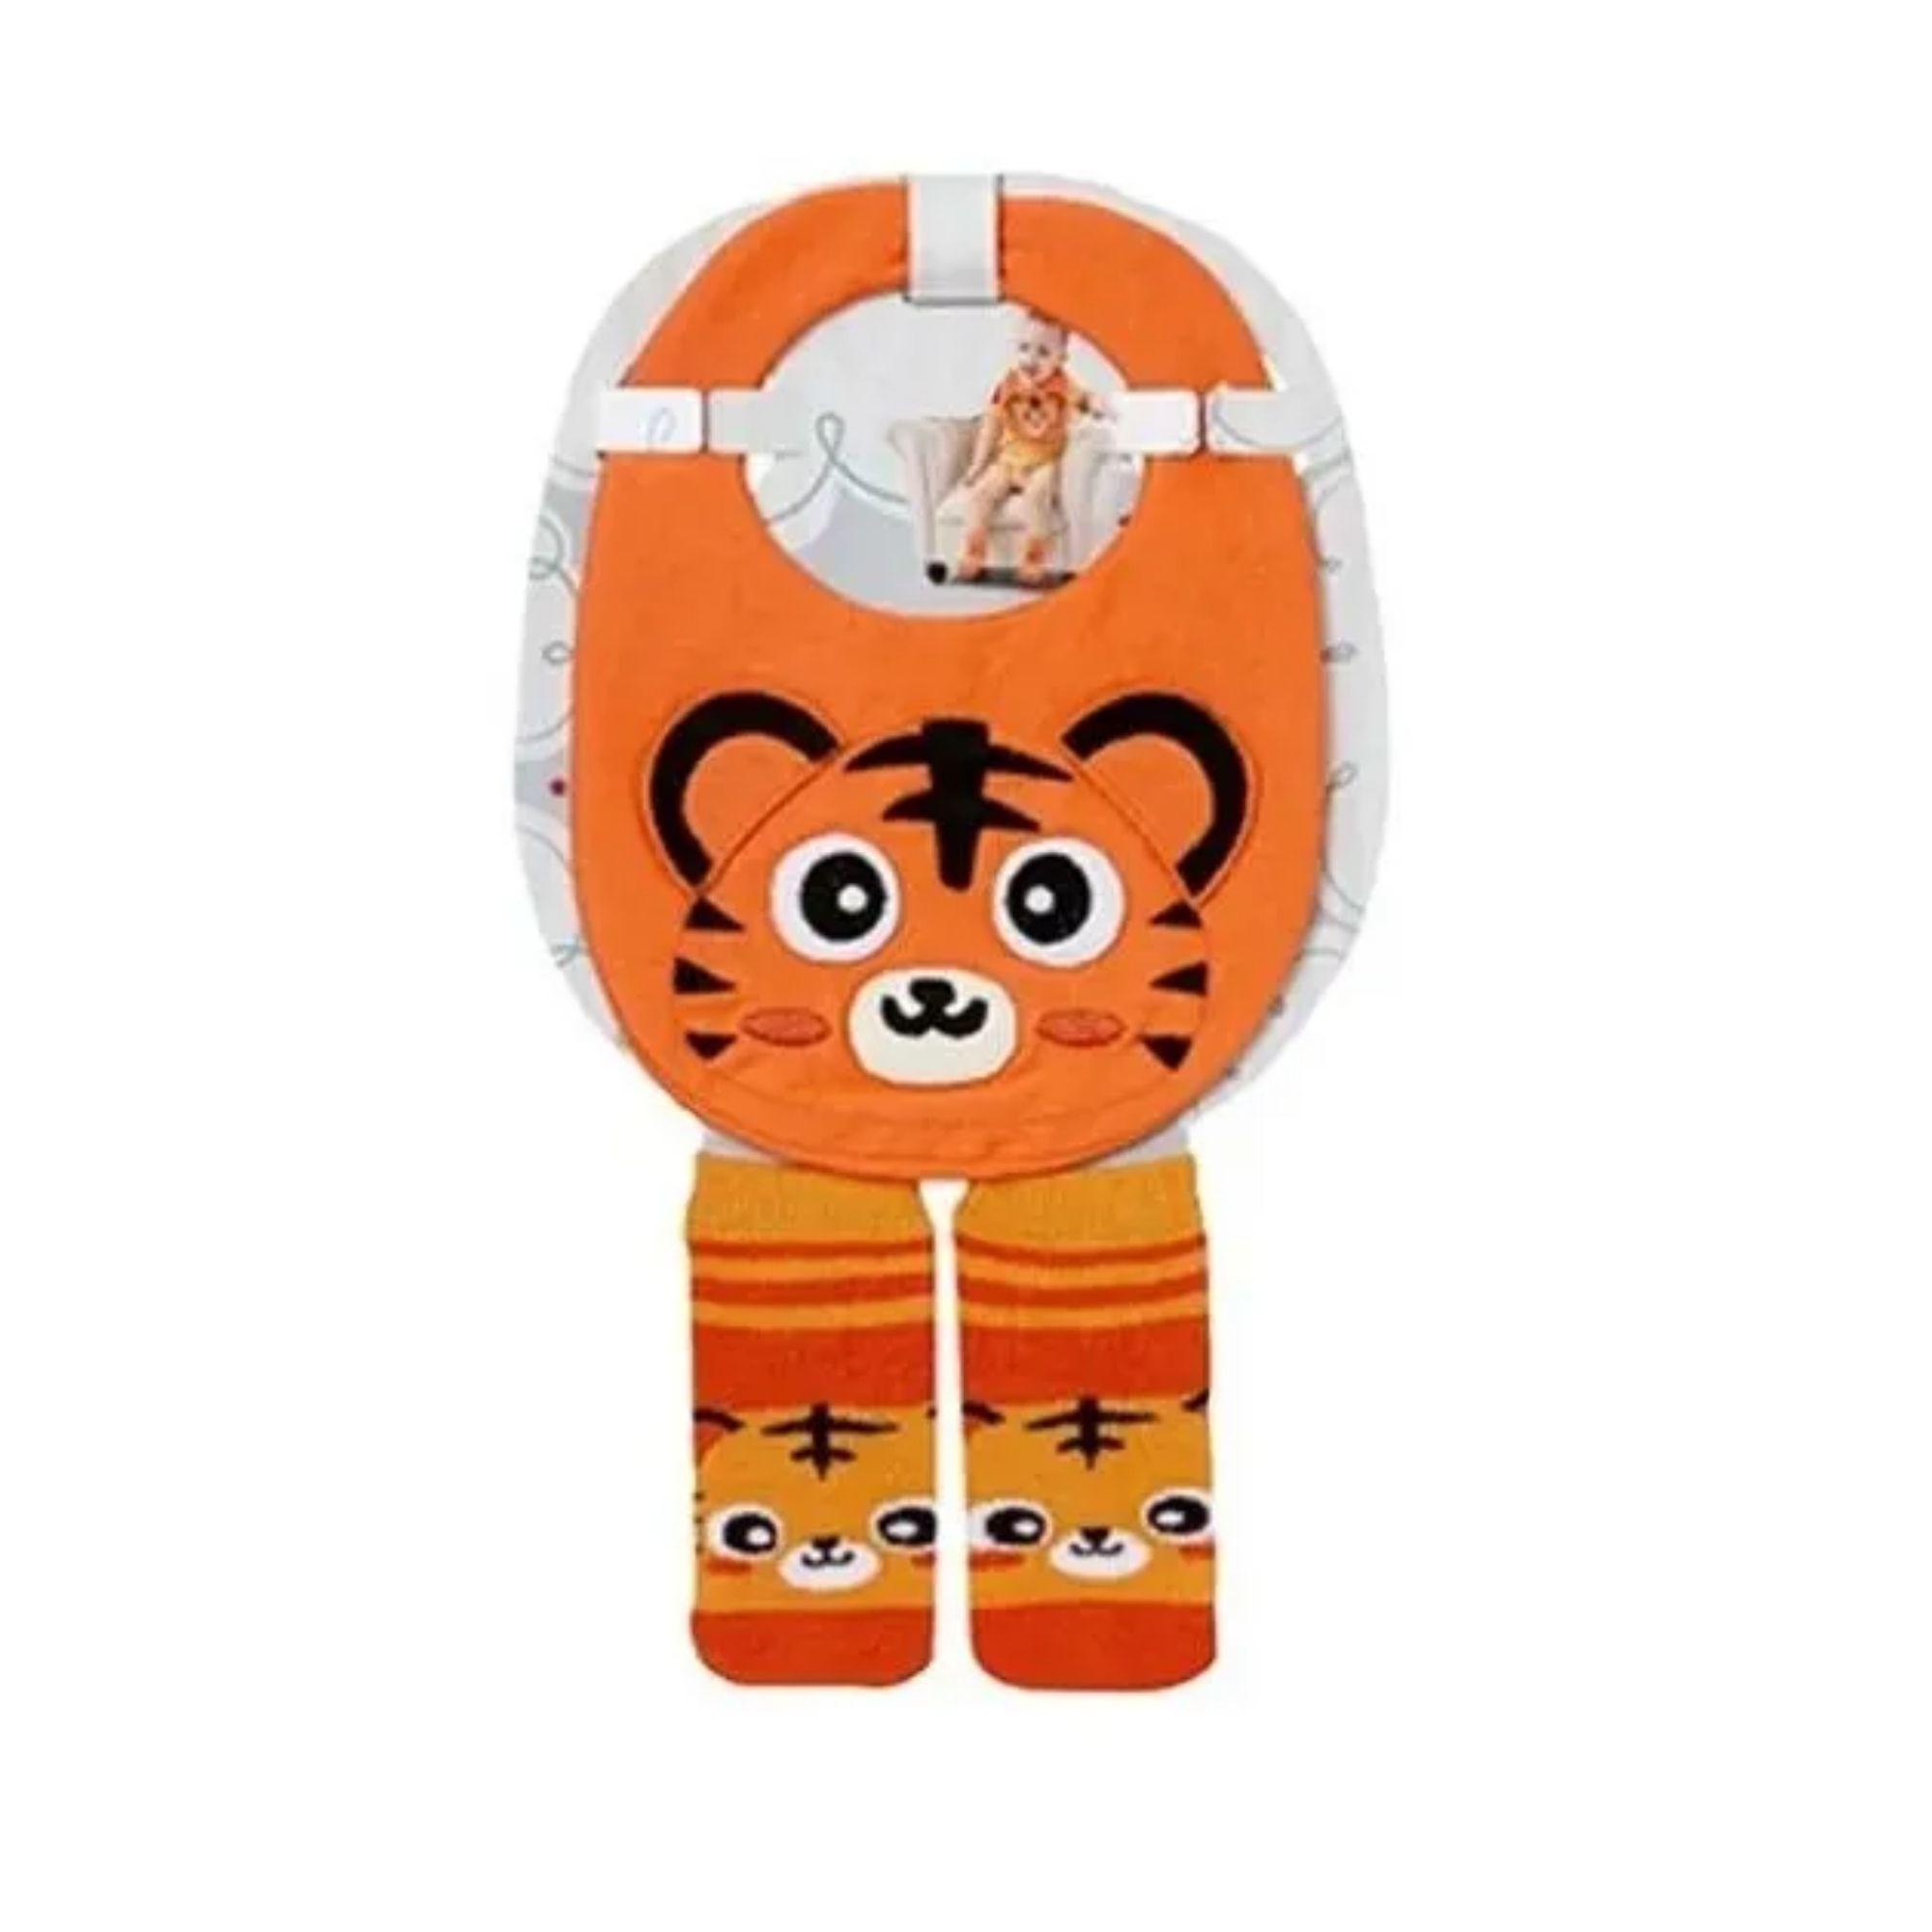 Kit Babador + meia para Bebê Infantil mesma estampa Colorido 9 a 12 meses  - Game Land Brinquedos